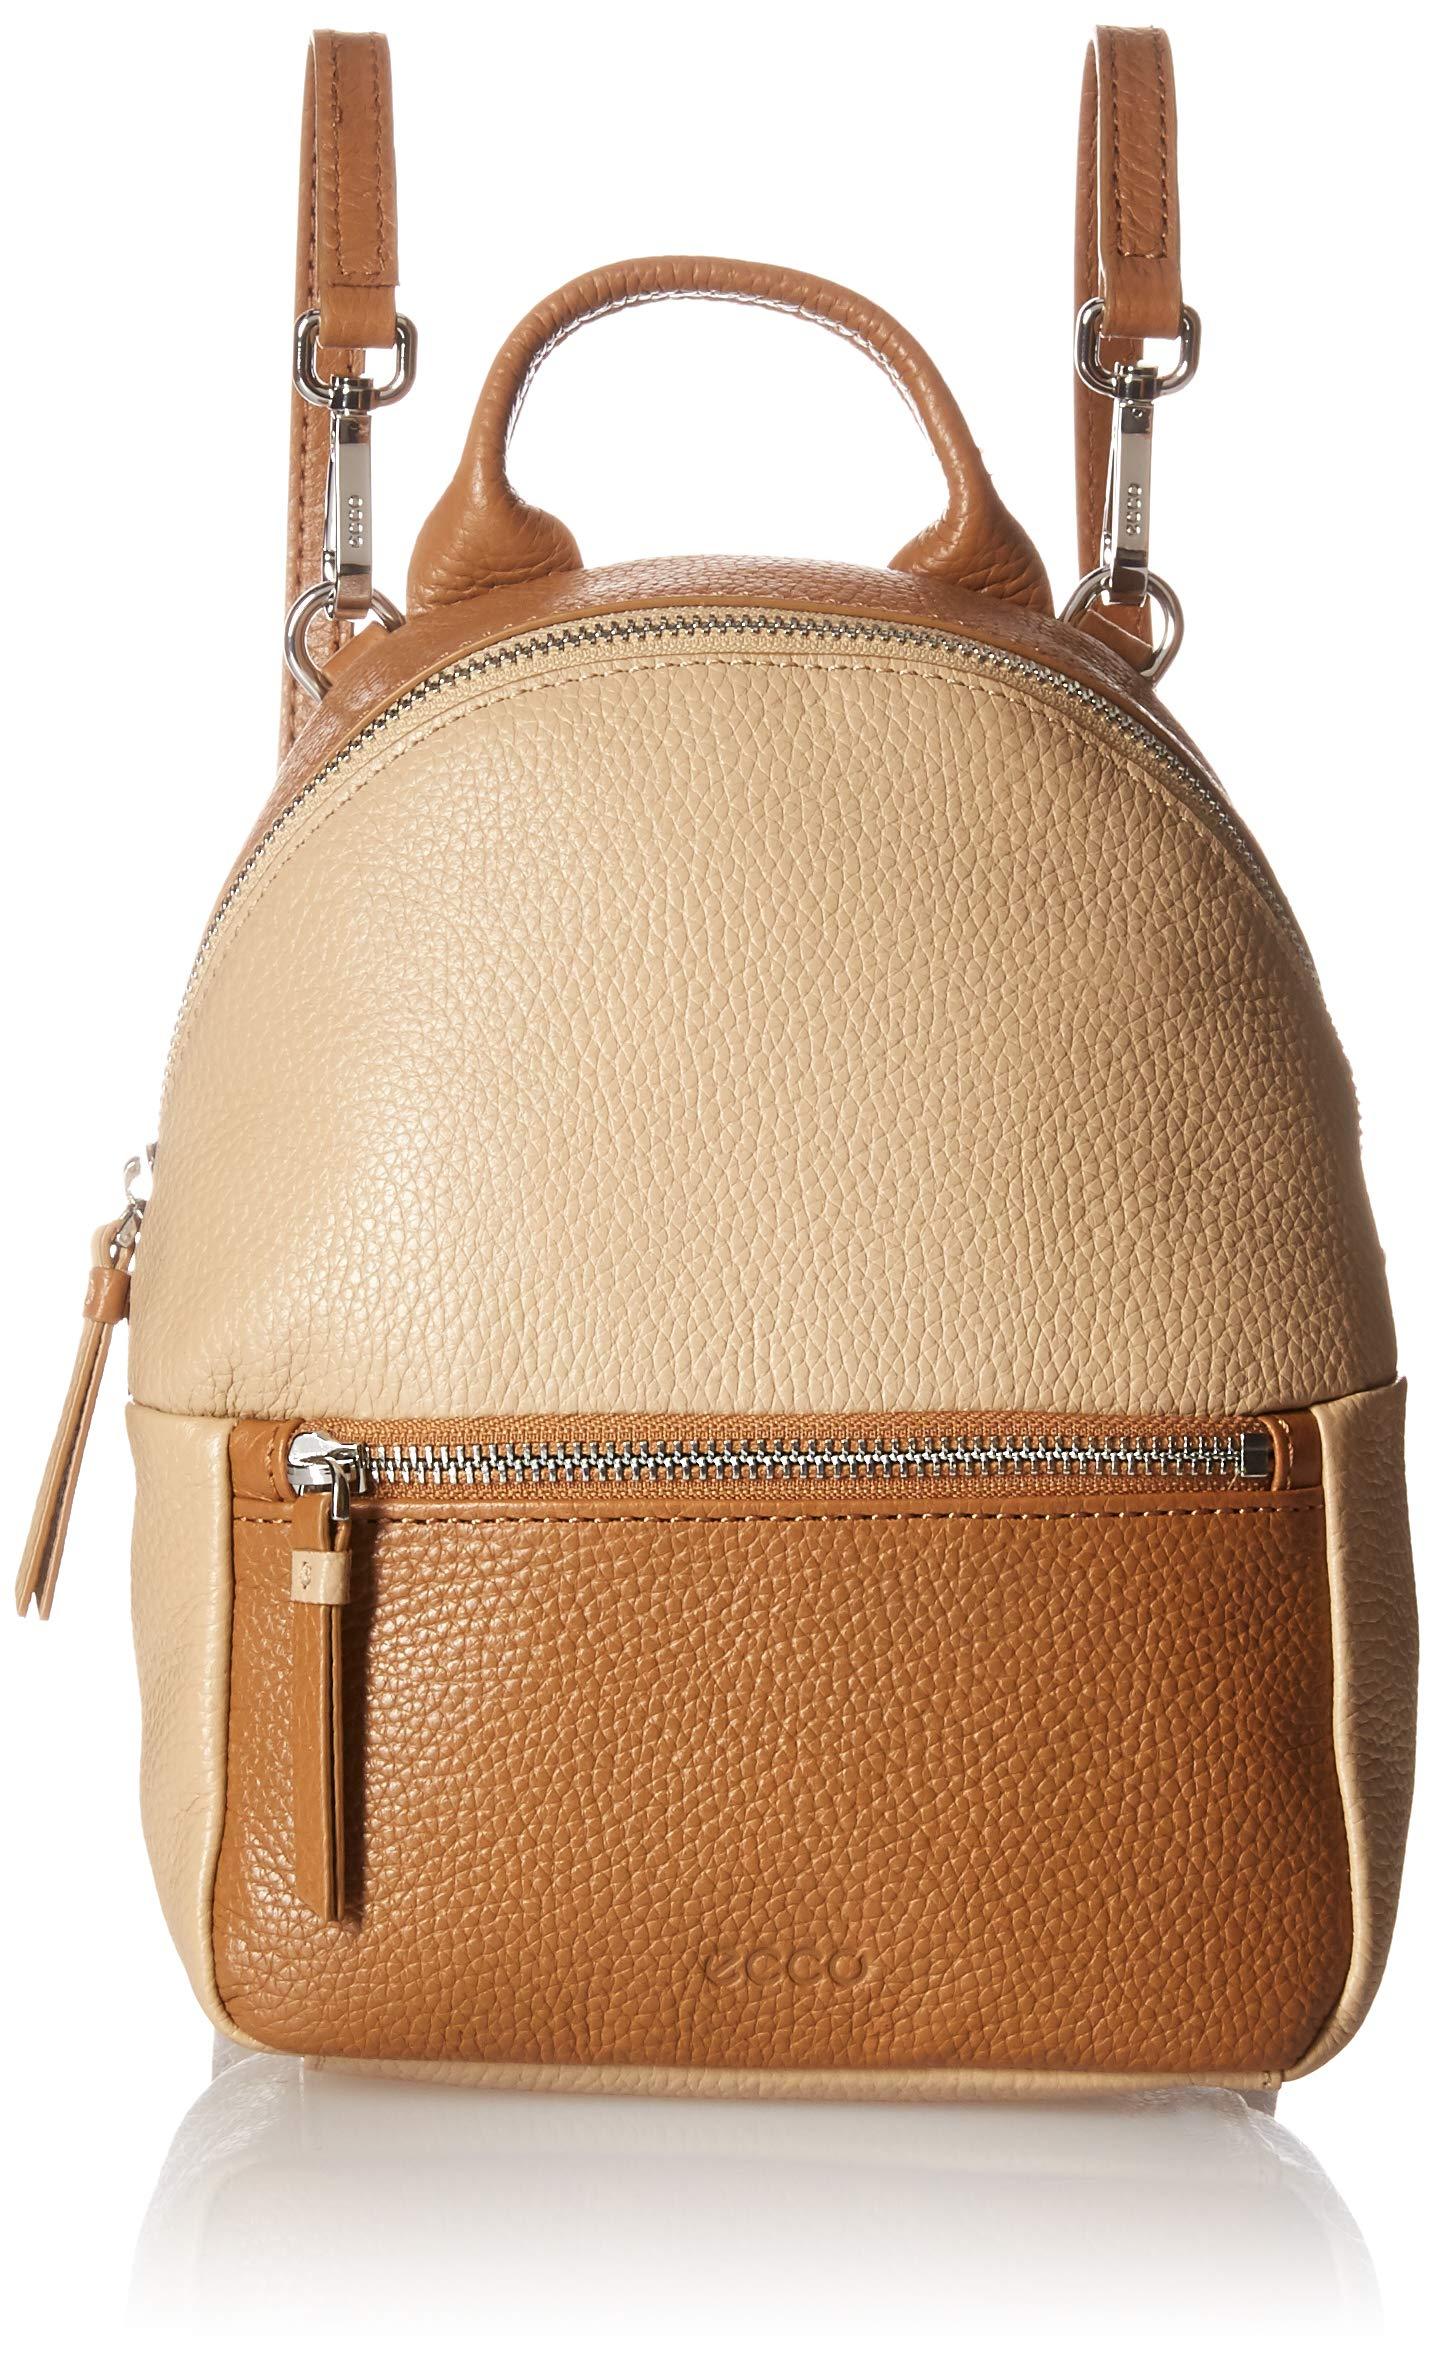 ECCO SP 3 Mini Backpack,  Cashmere/Volluto, One Size